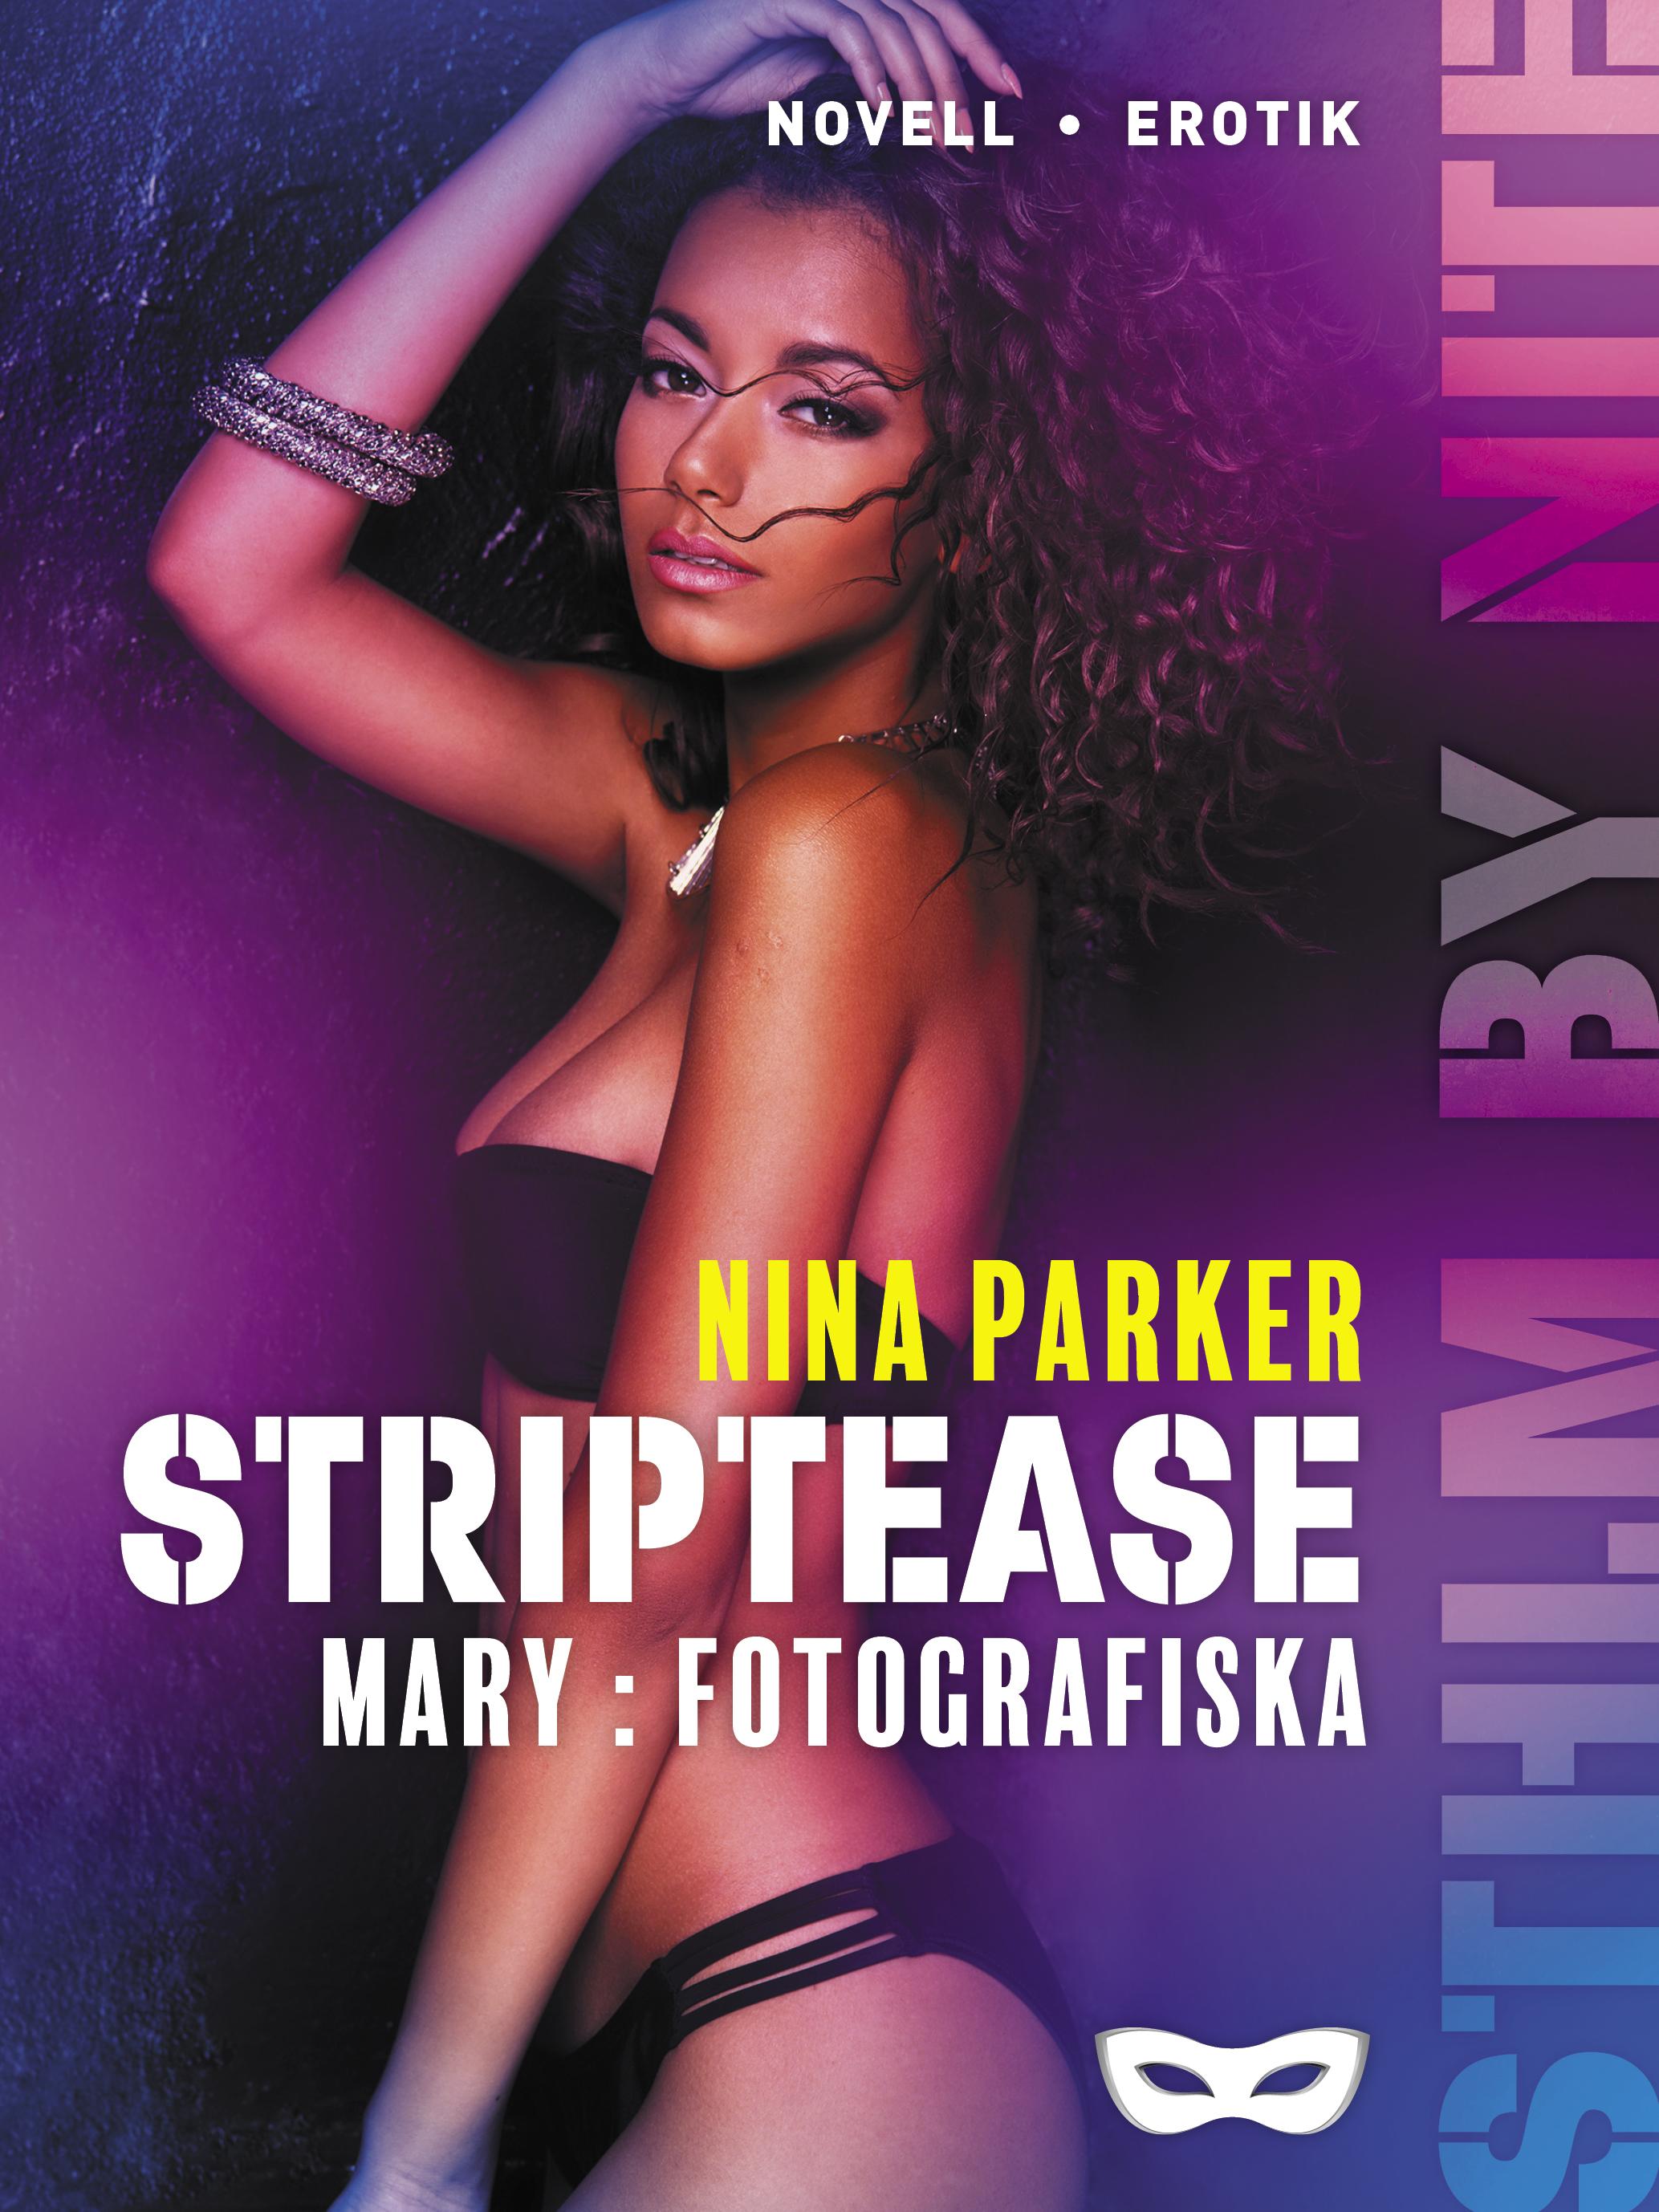 STRIPTEASE-n_Striptease_Nina Parker.jpg